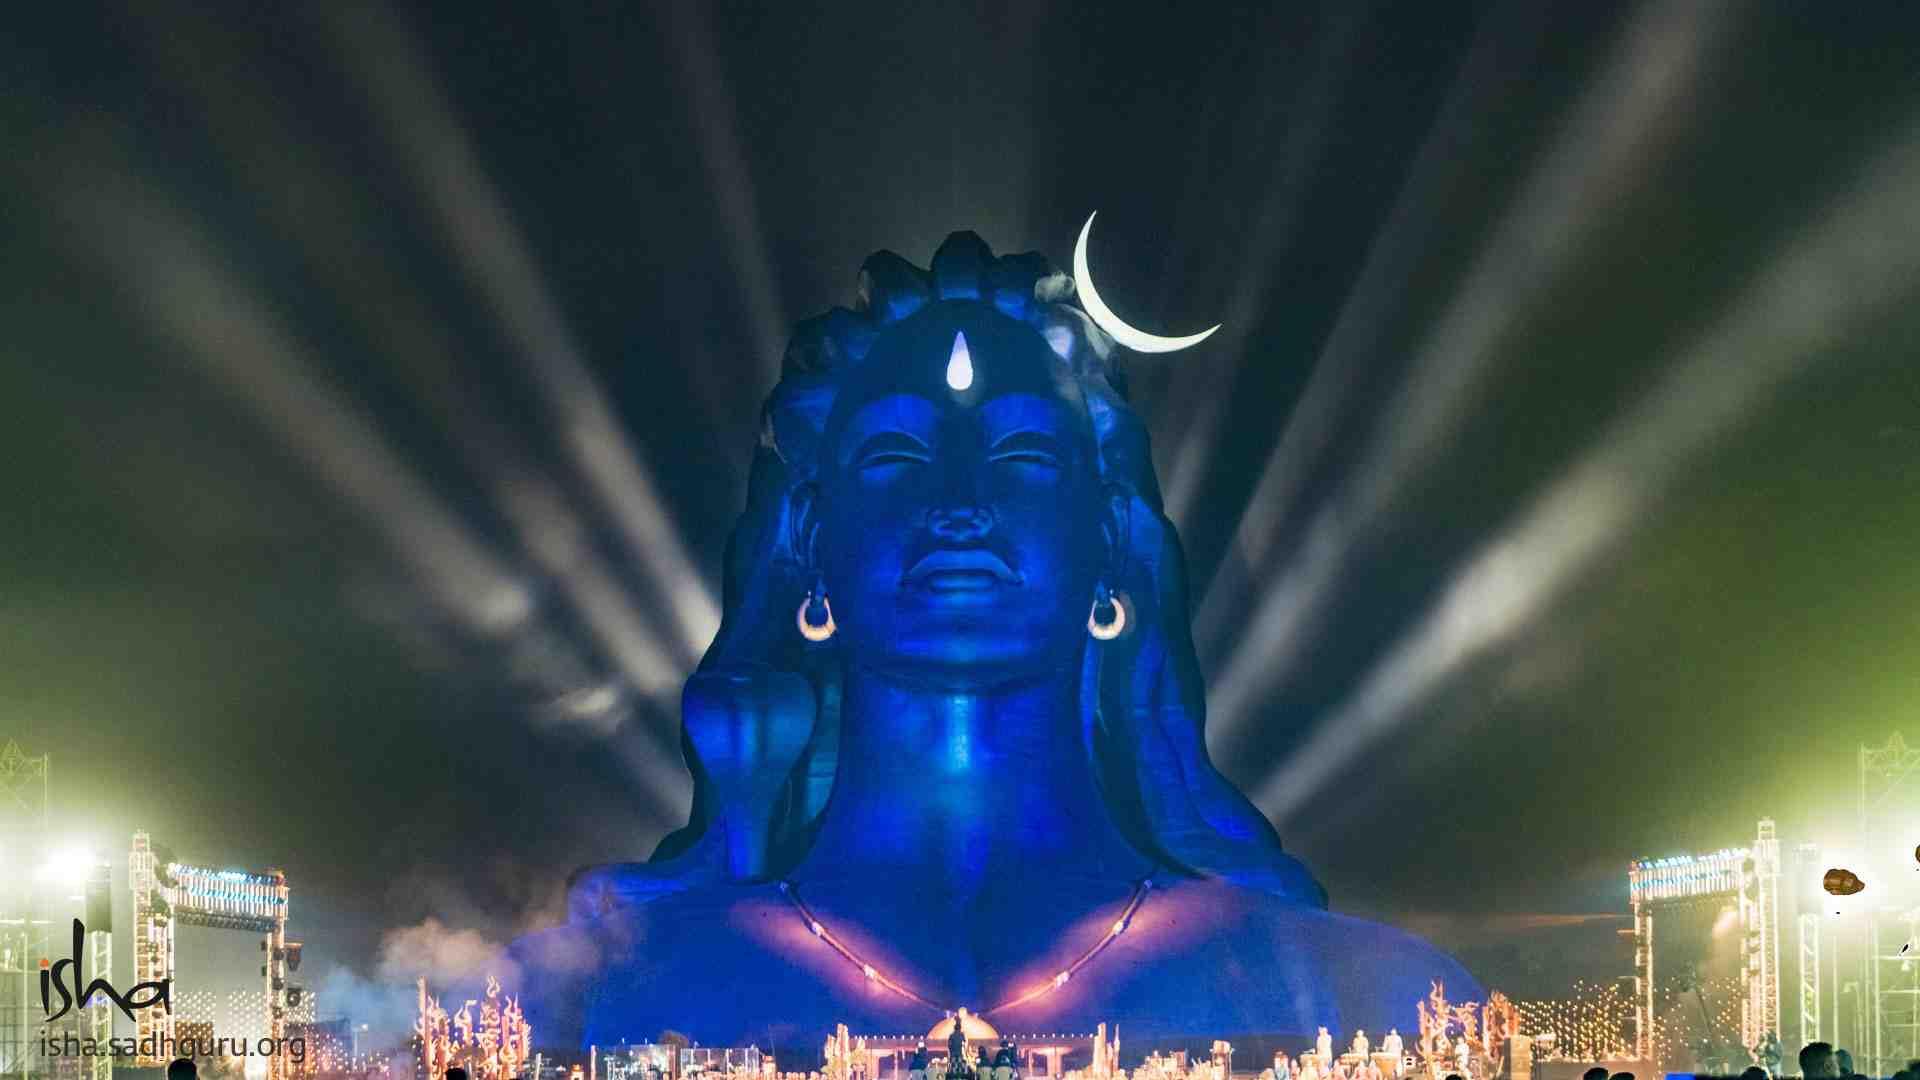 Shiva Wallpaper - Mahashivratri celebrations at the 112 ft Adiyogi Statue